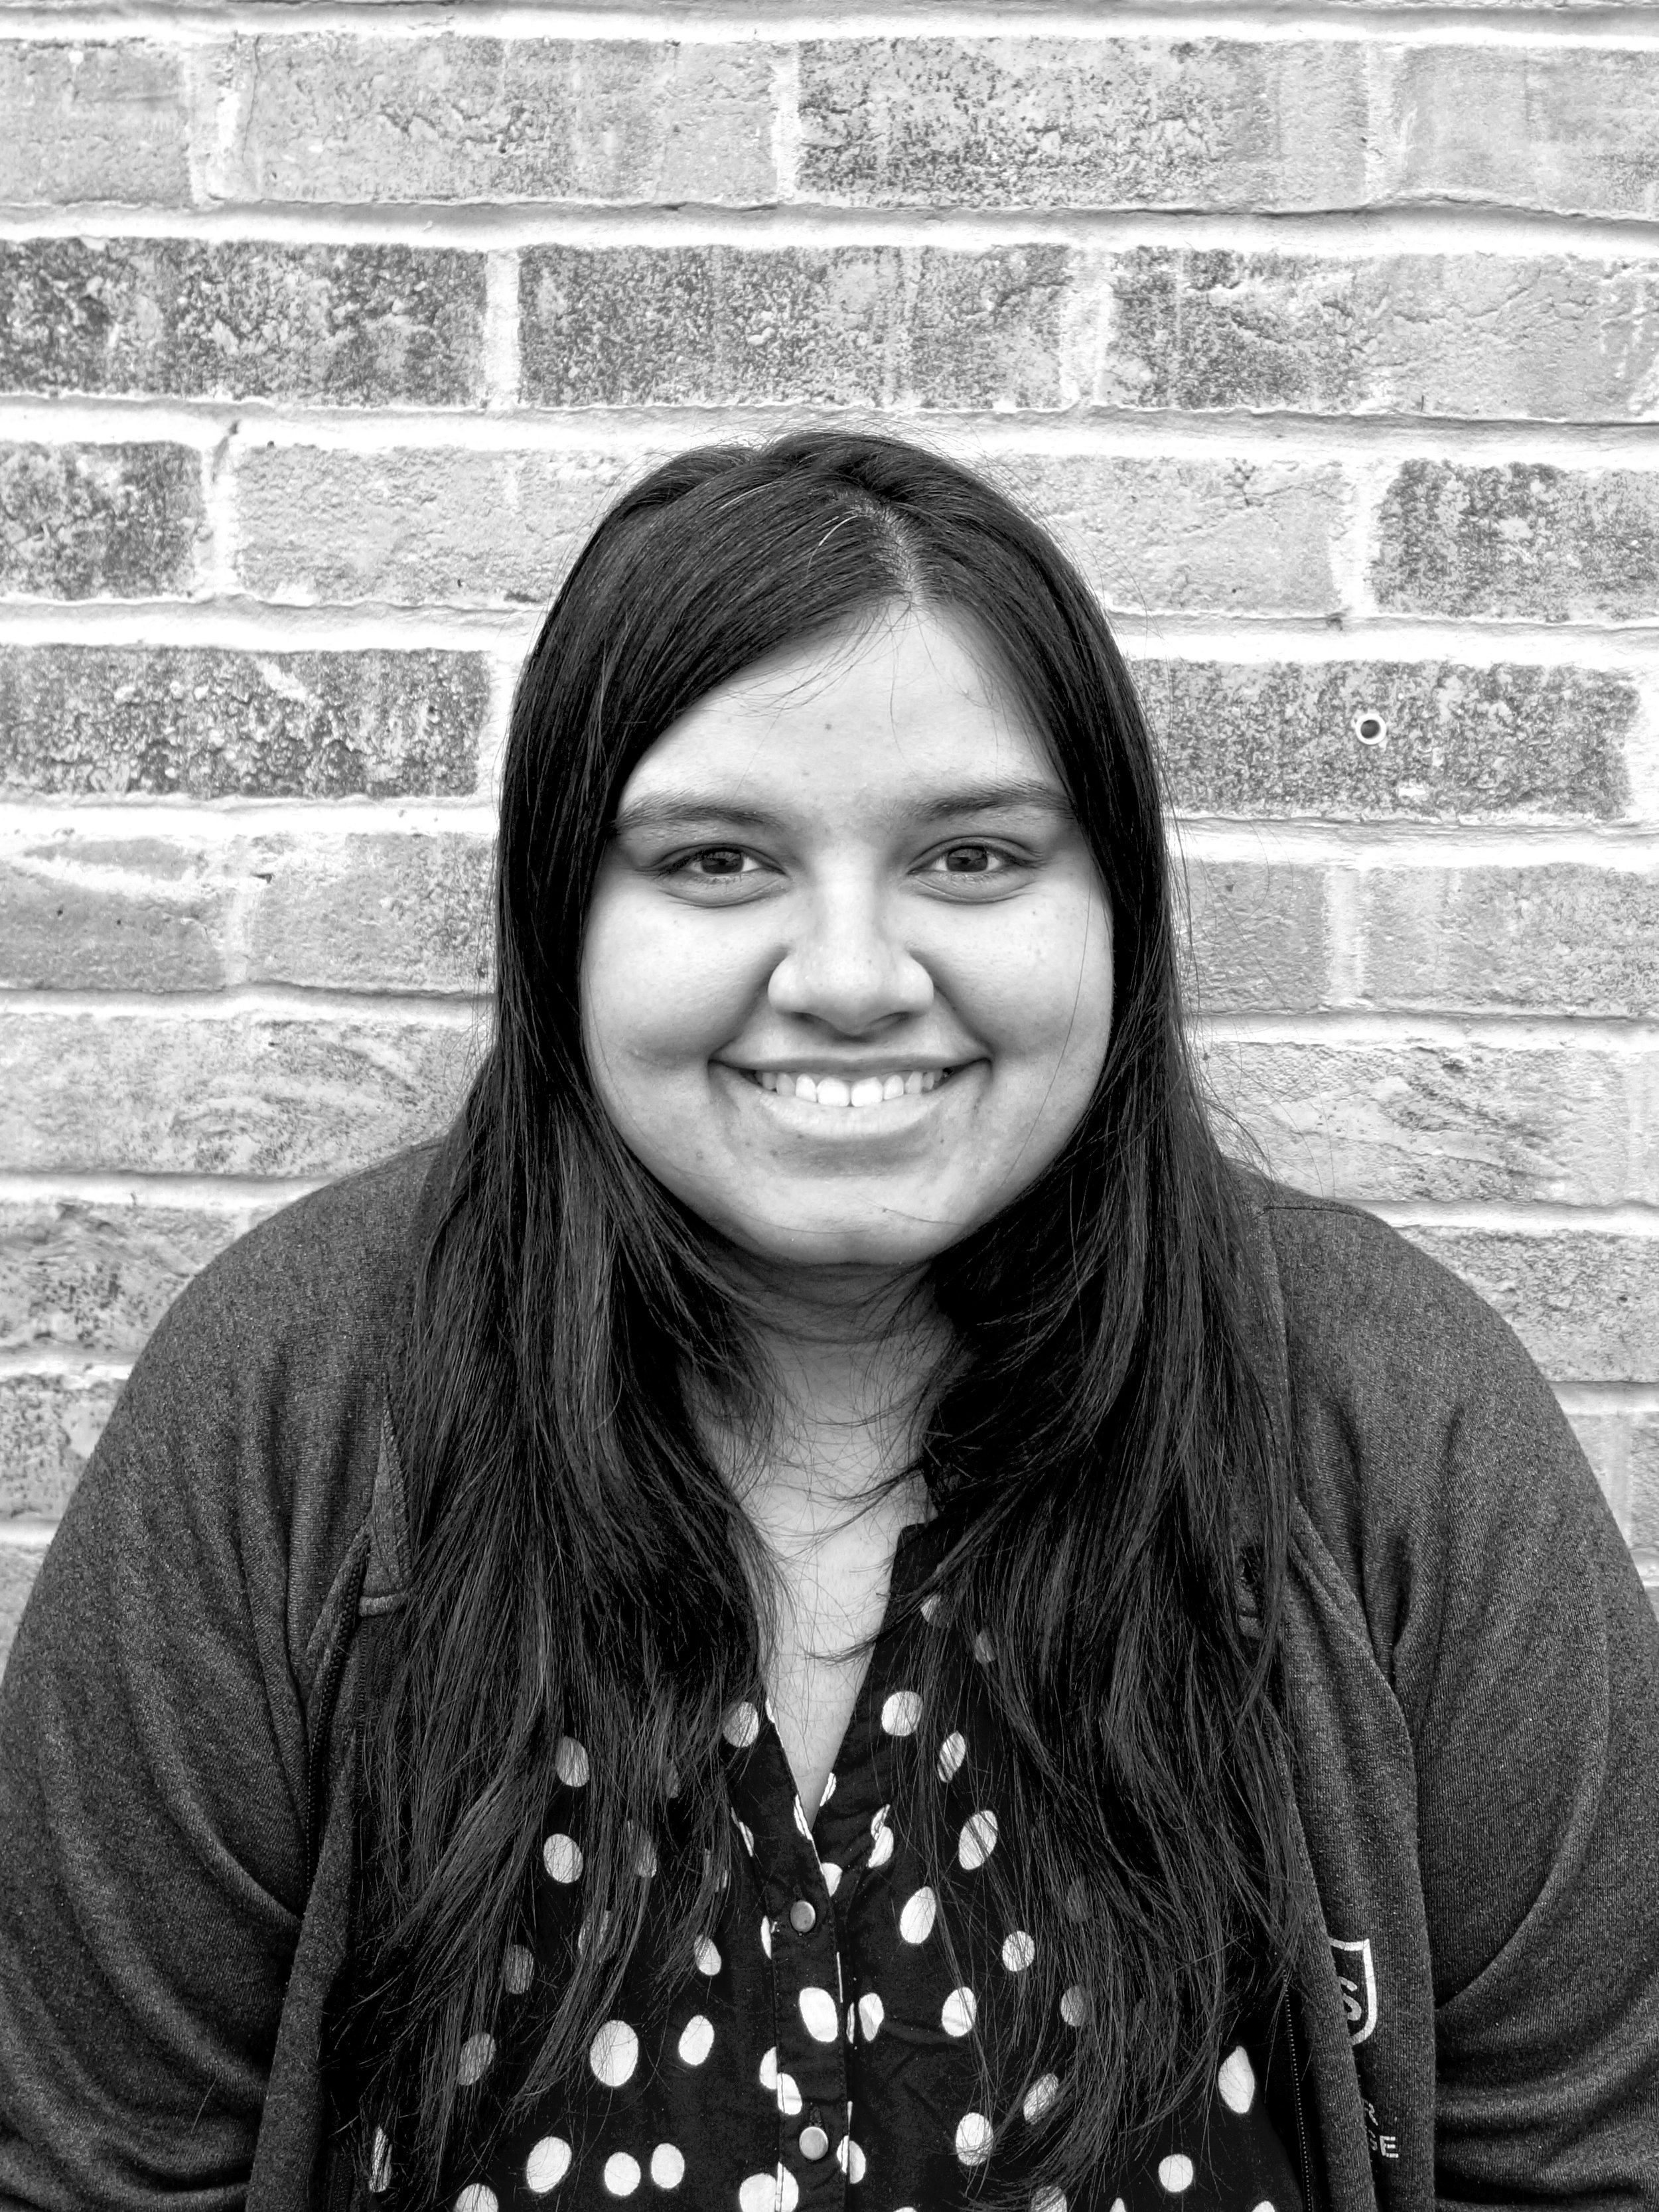 Urvashi Bohra - Assistant Producer